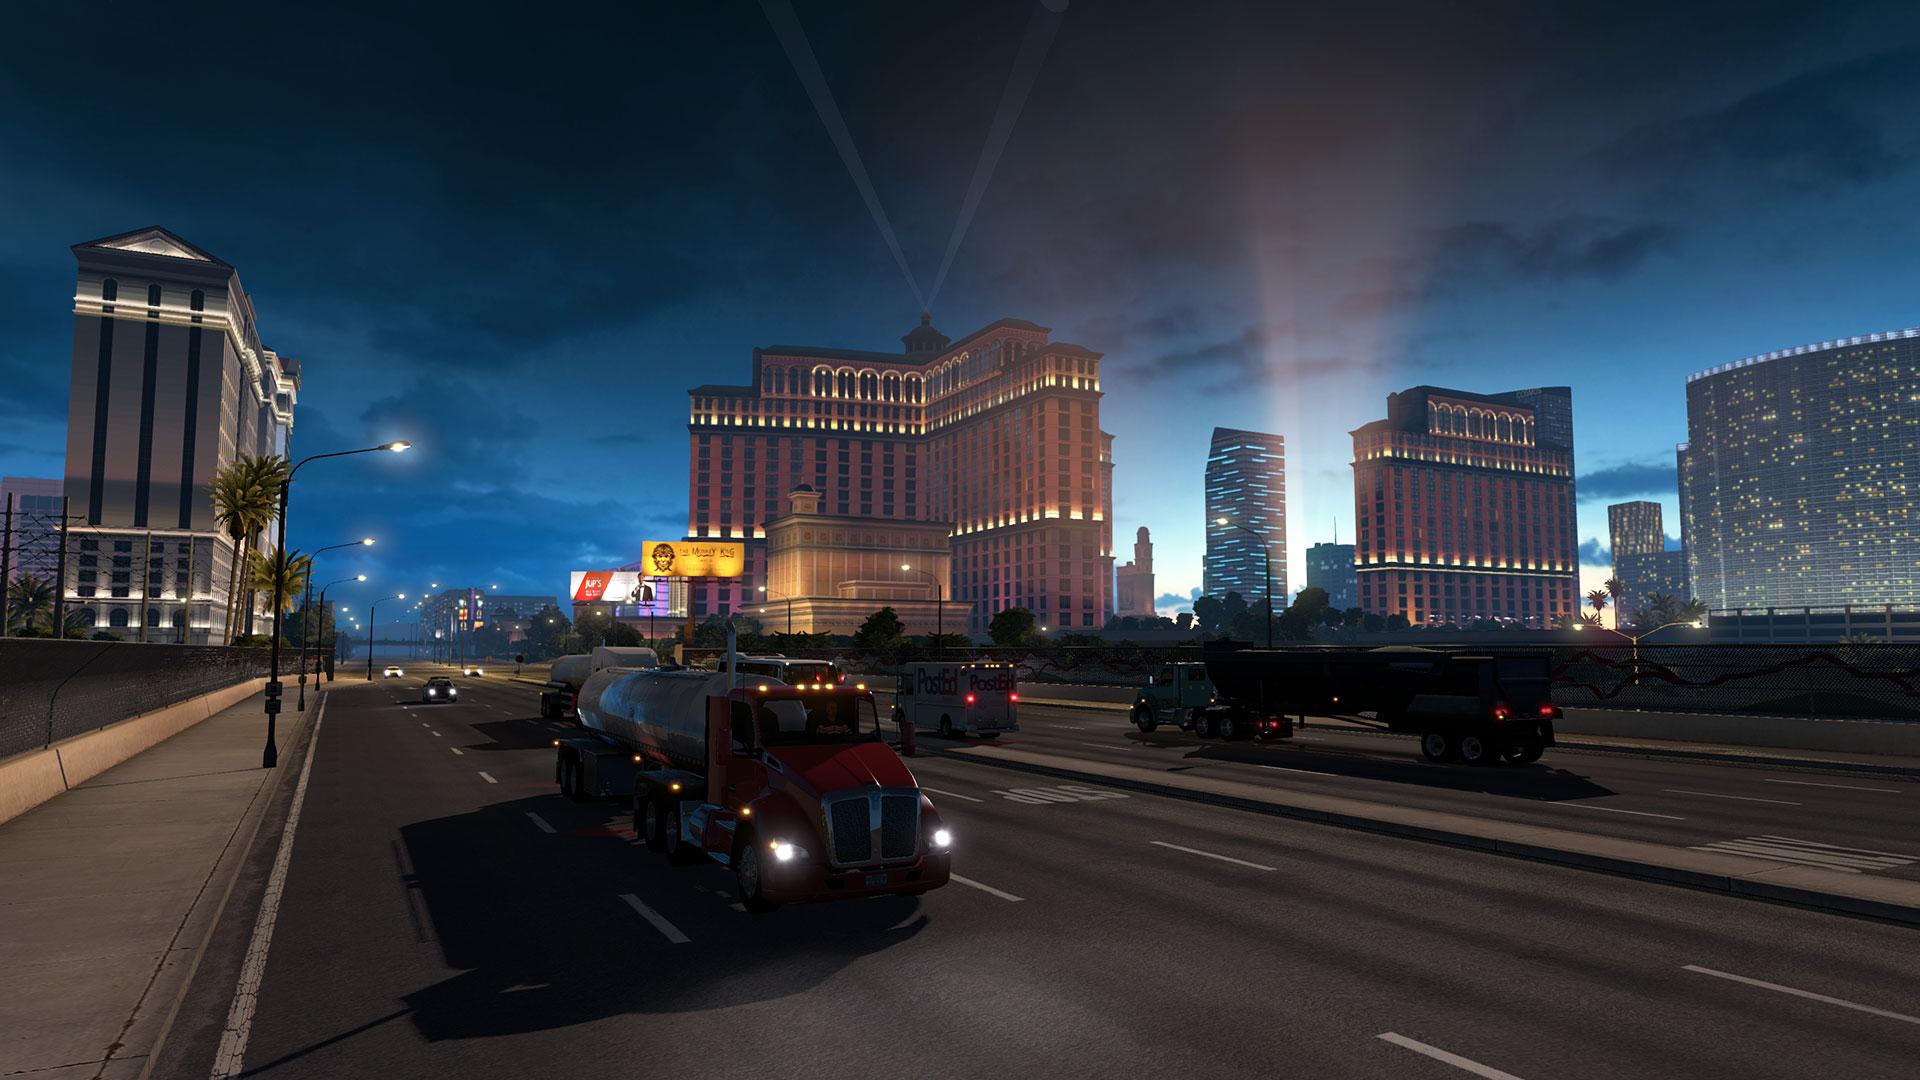 美国卡车模拟 VR (American Truck Simulator)插图(2)